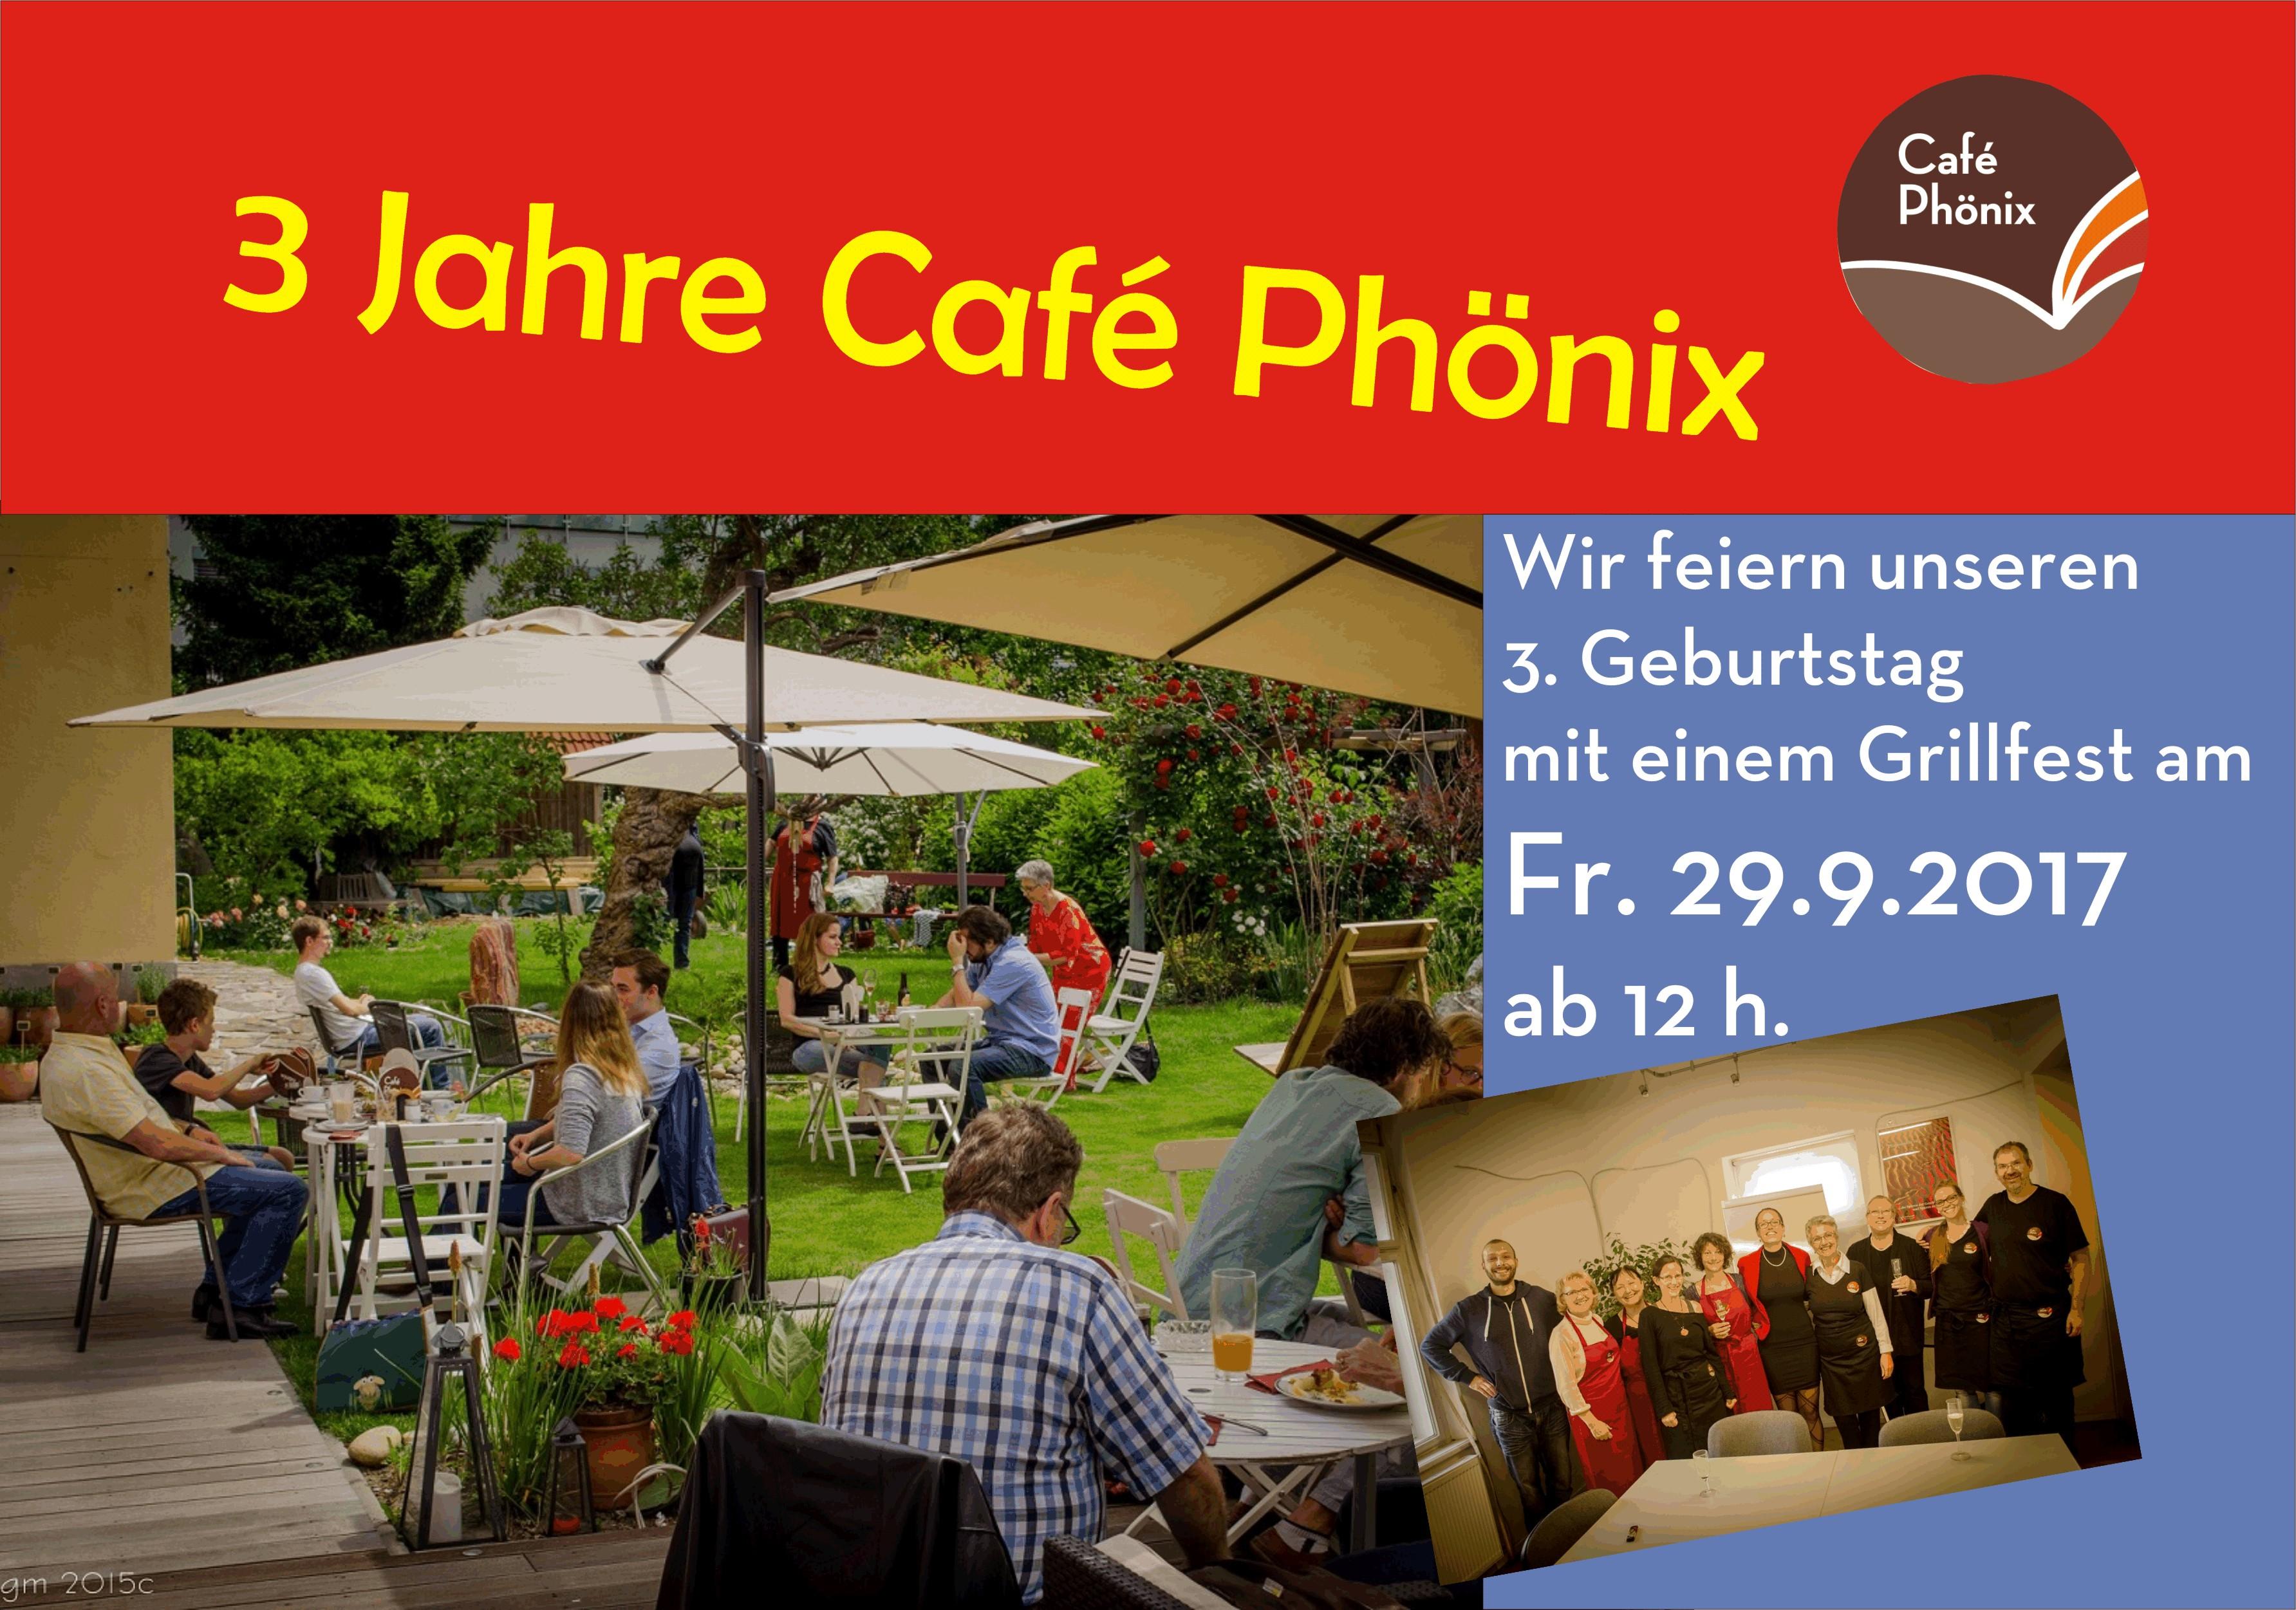 3 Jahre Cafe Phönix!!!